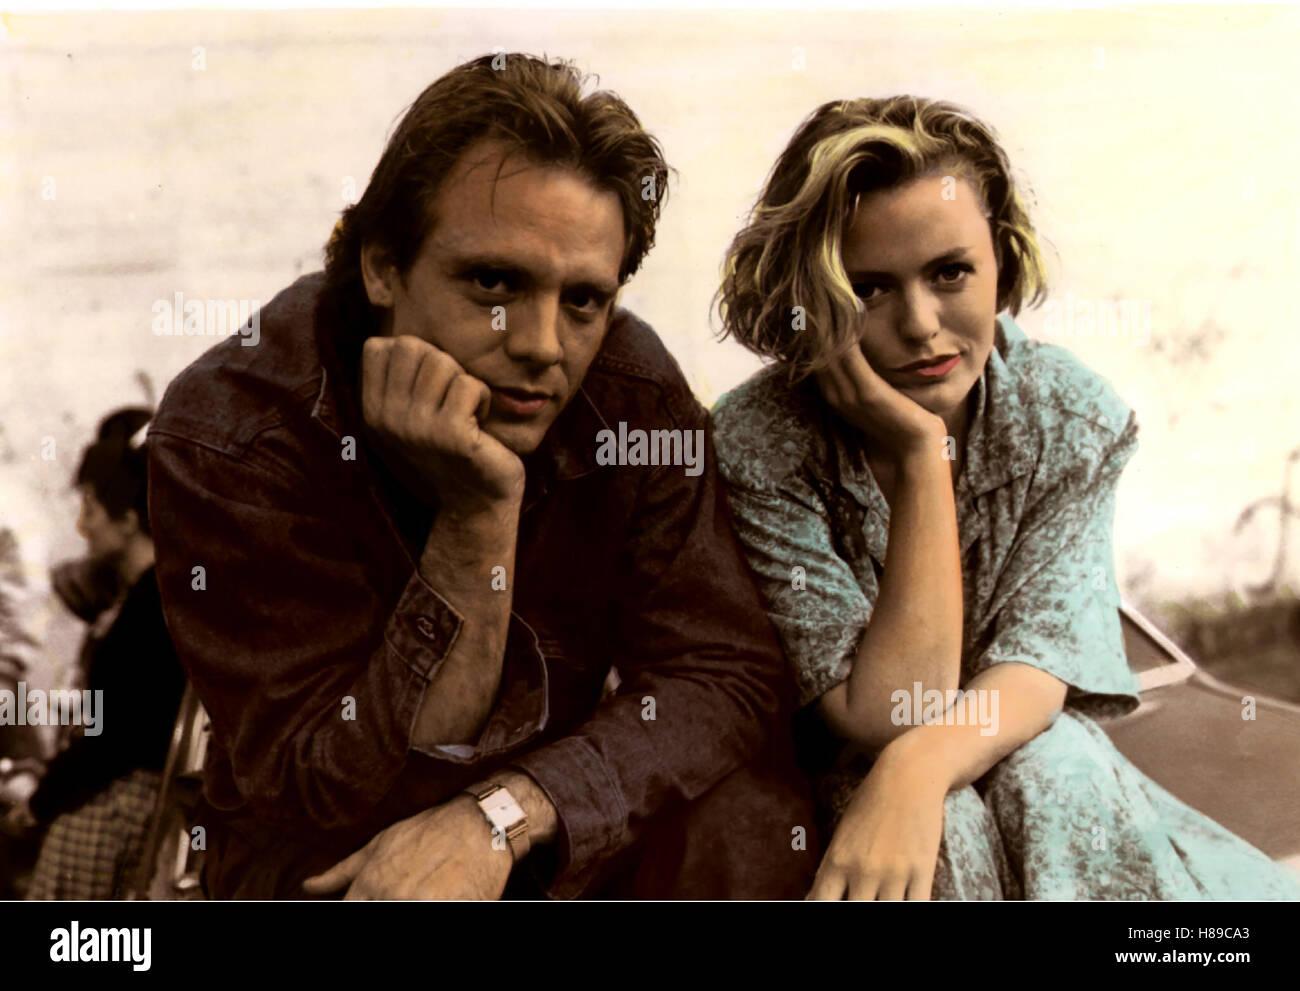 Timebomb, (TIMEBOMB) TVM USA 1991, Regie: Avi Nesher, MICHAEL BIEHN + PATSY KENSIT - Stock Image